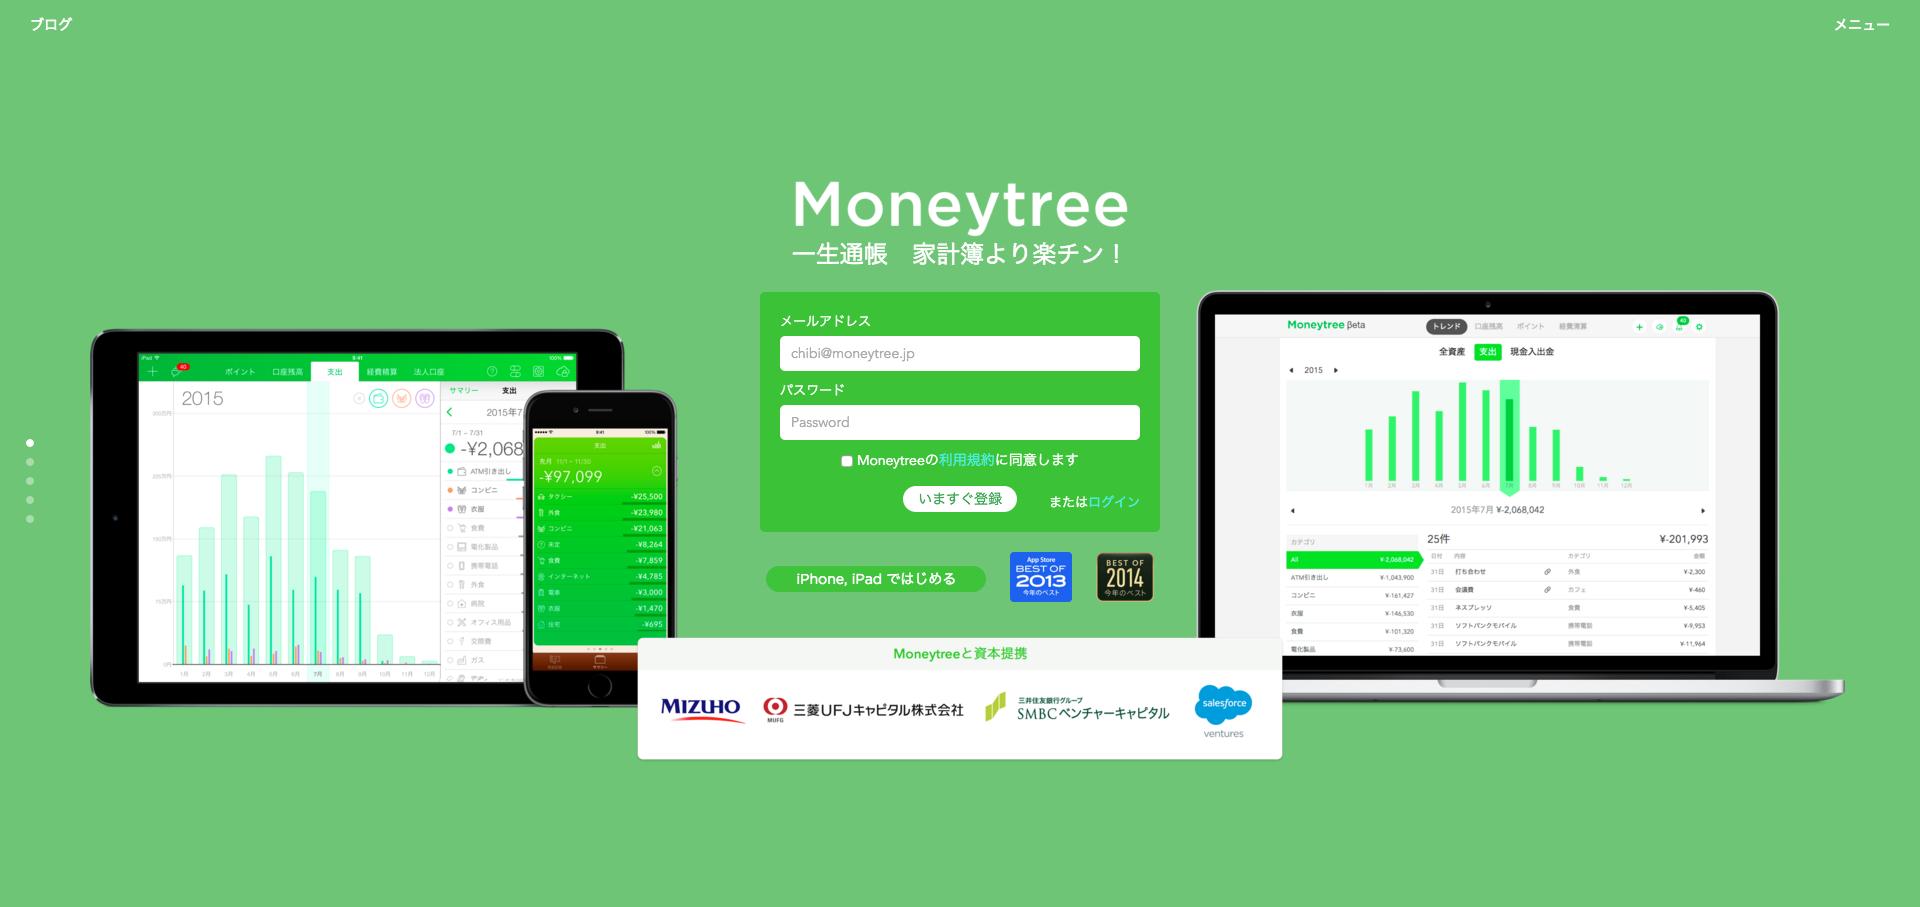 Moneytreeがもっと自由自財に! 待望のウェブバージョンを発表